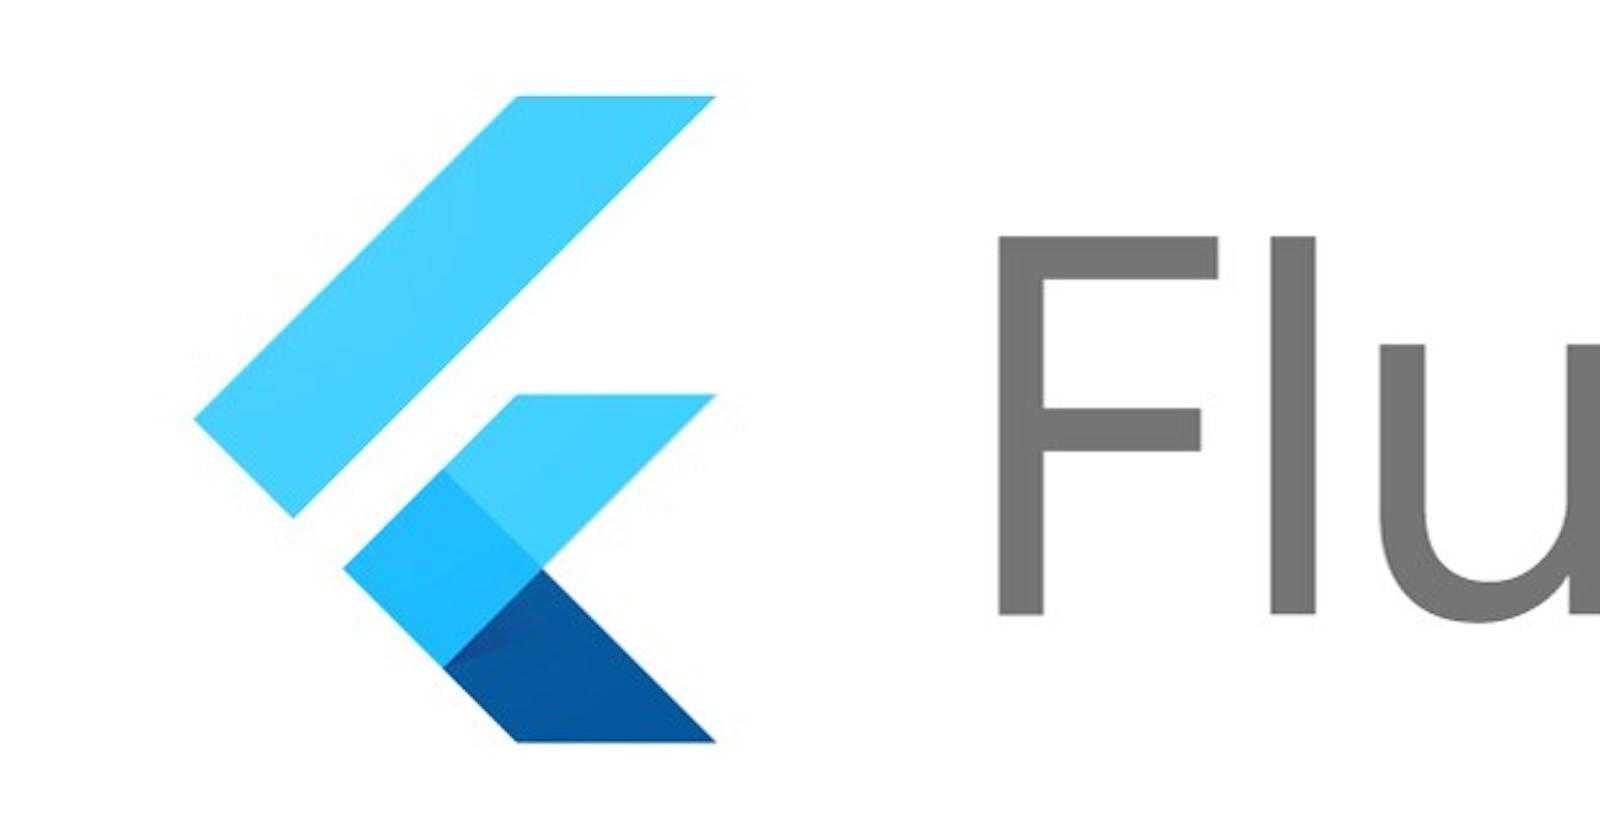 Unit Testing a Utility function that returns a Widget